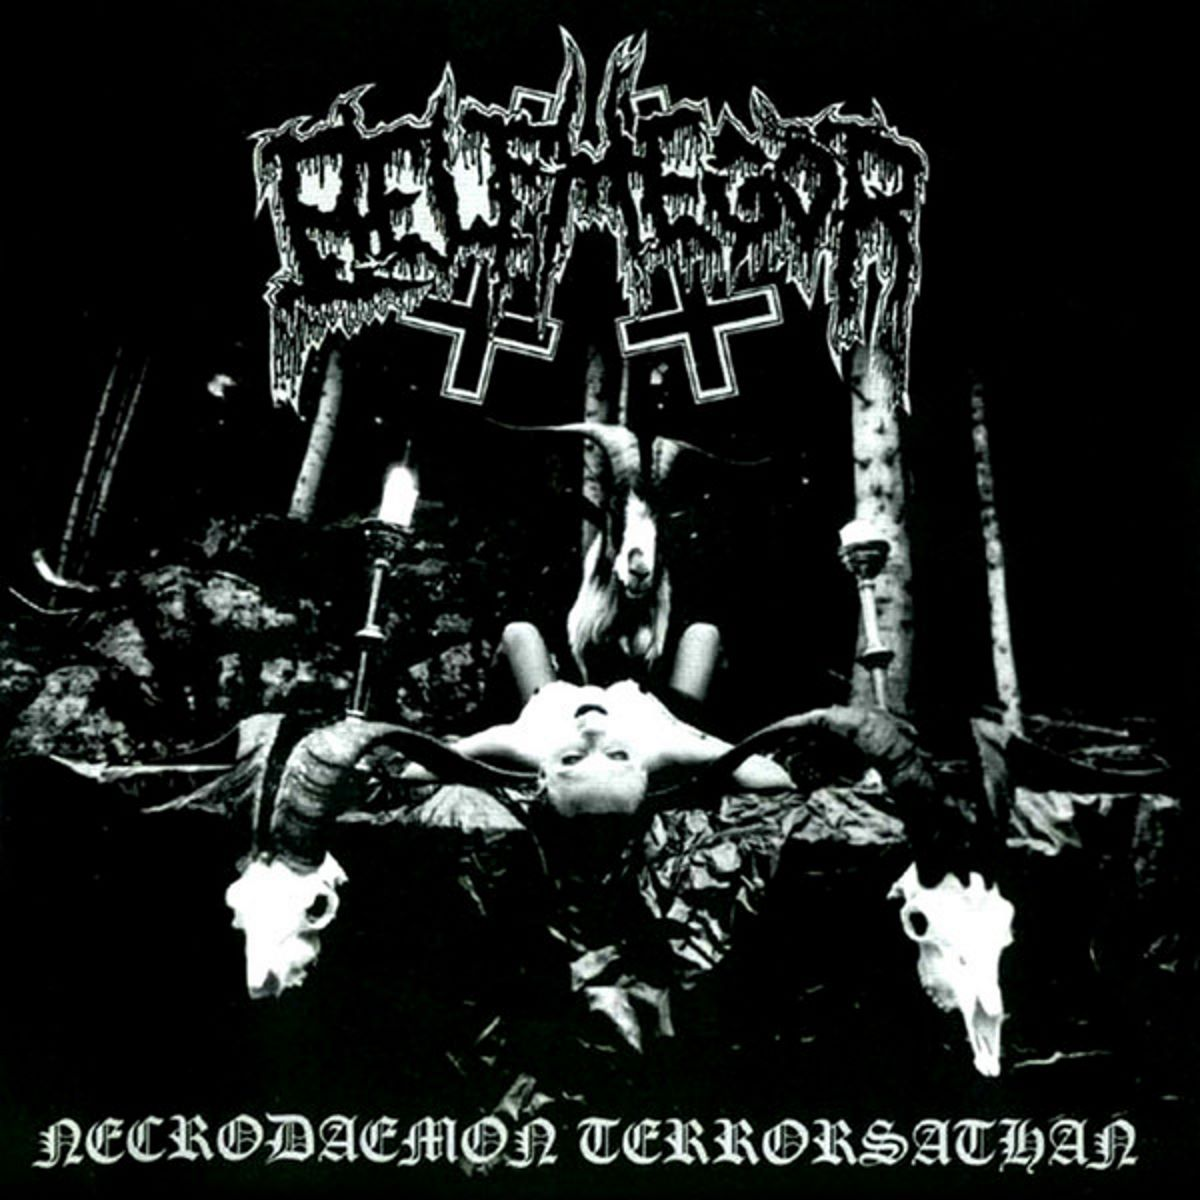 belphegor - Necrodaemon Terrorsathan - album cover